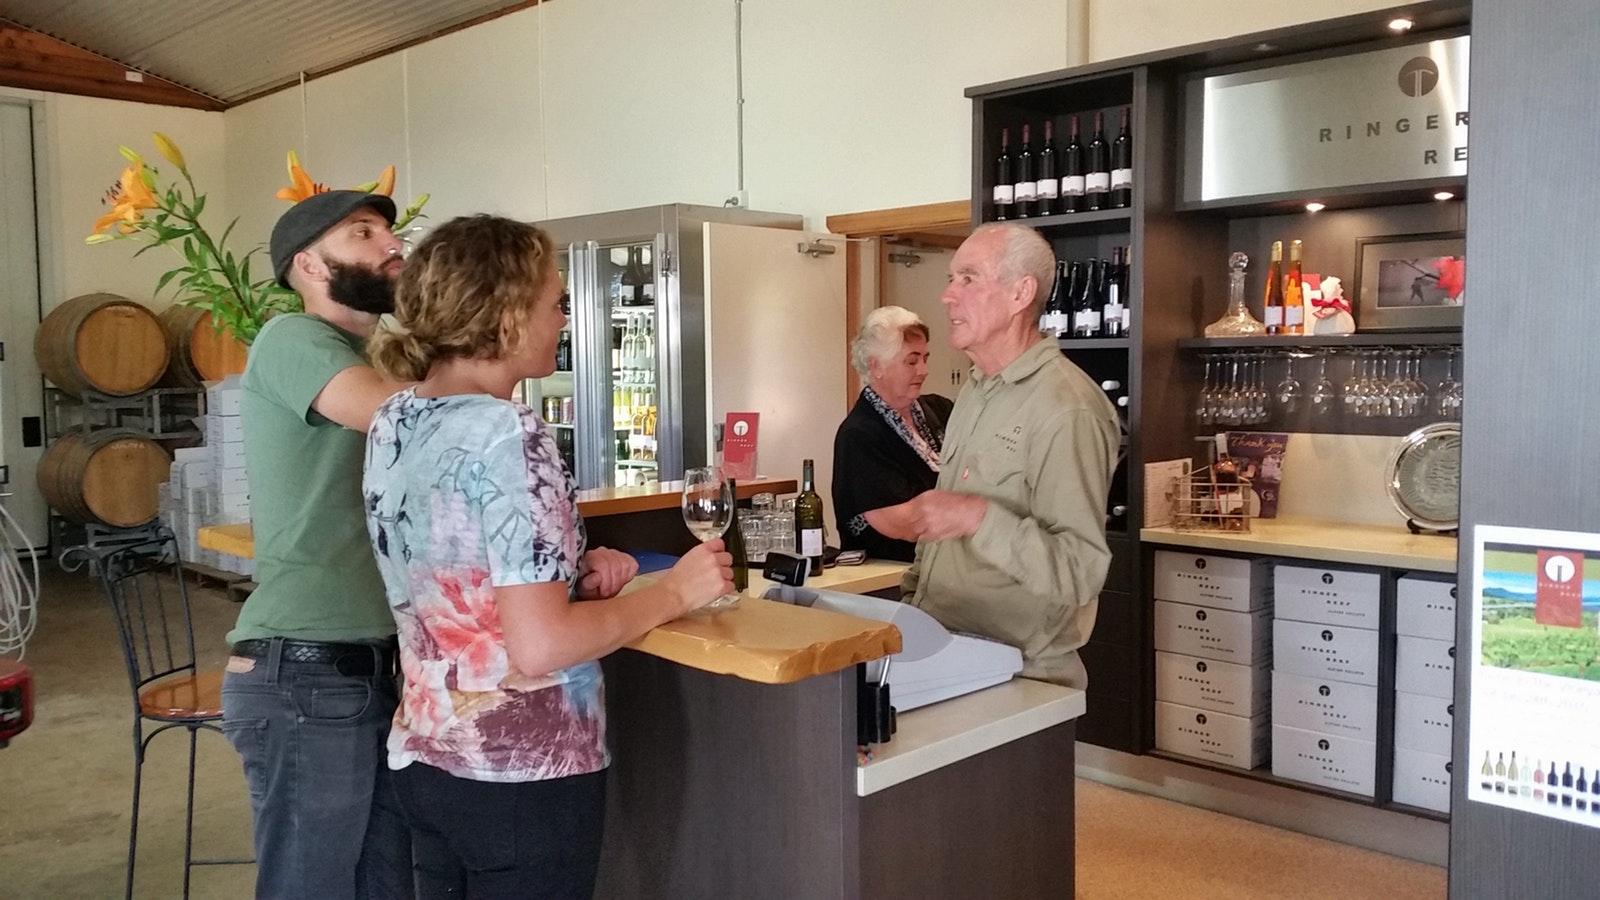 Winemaker talking wines at Ringer Reef Winery